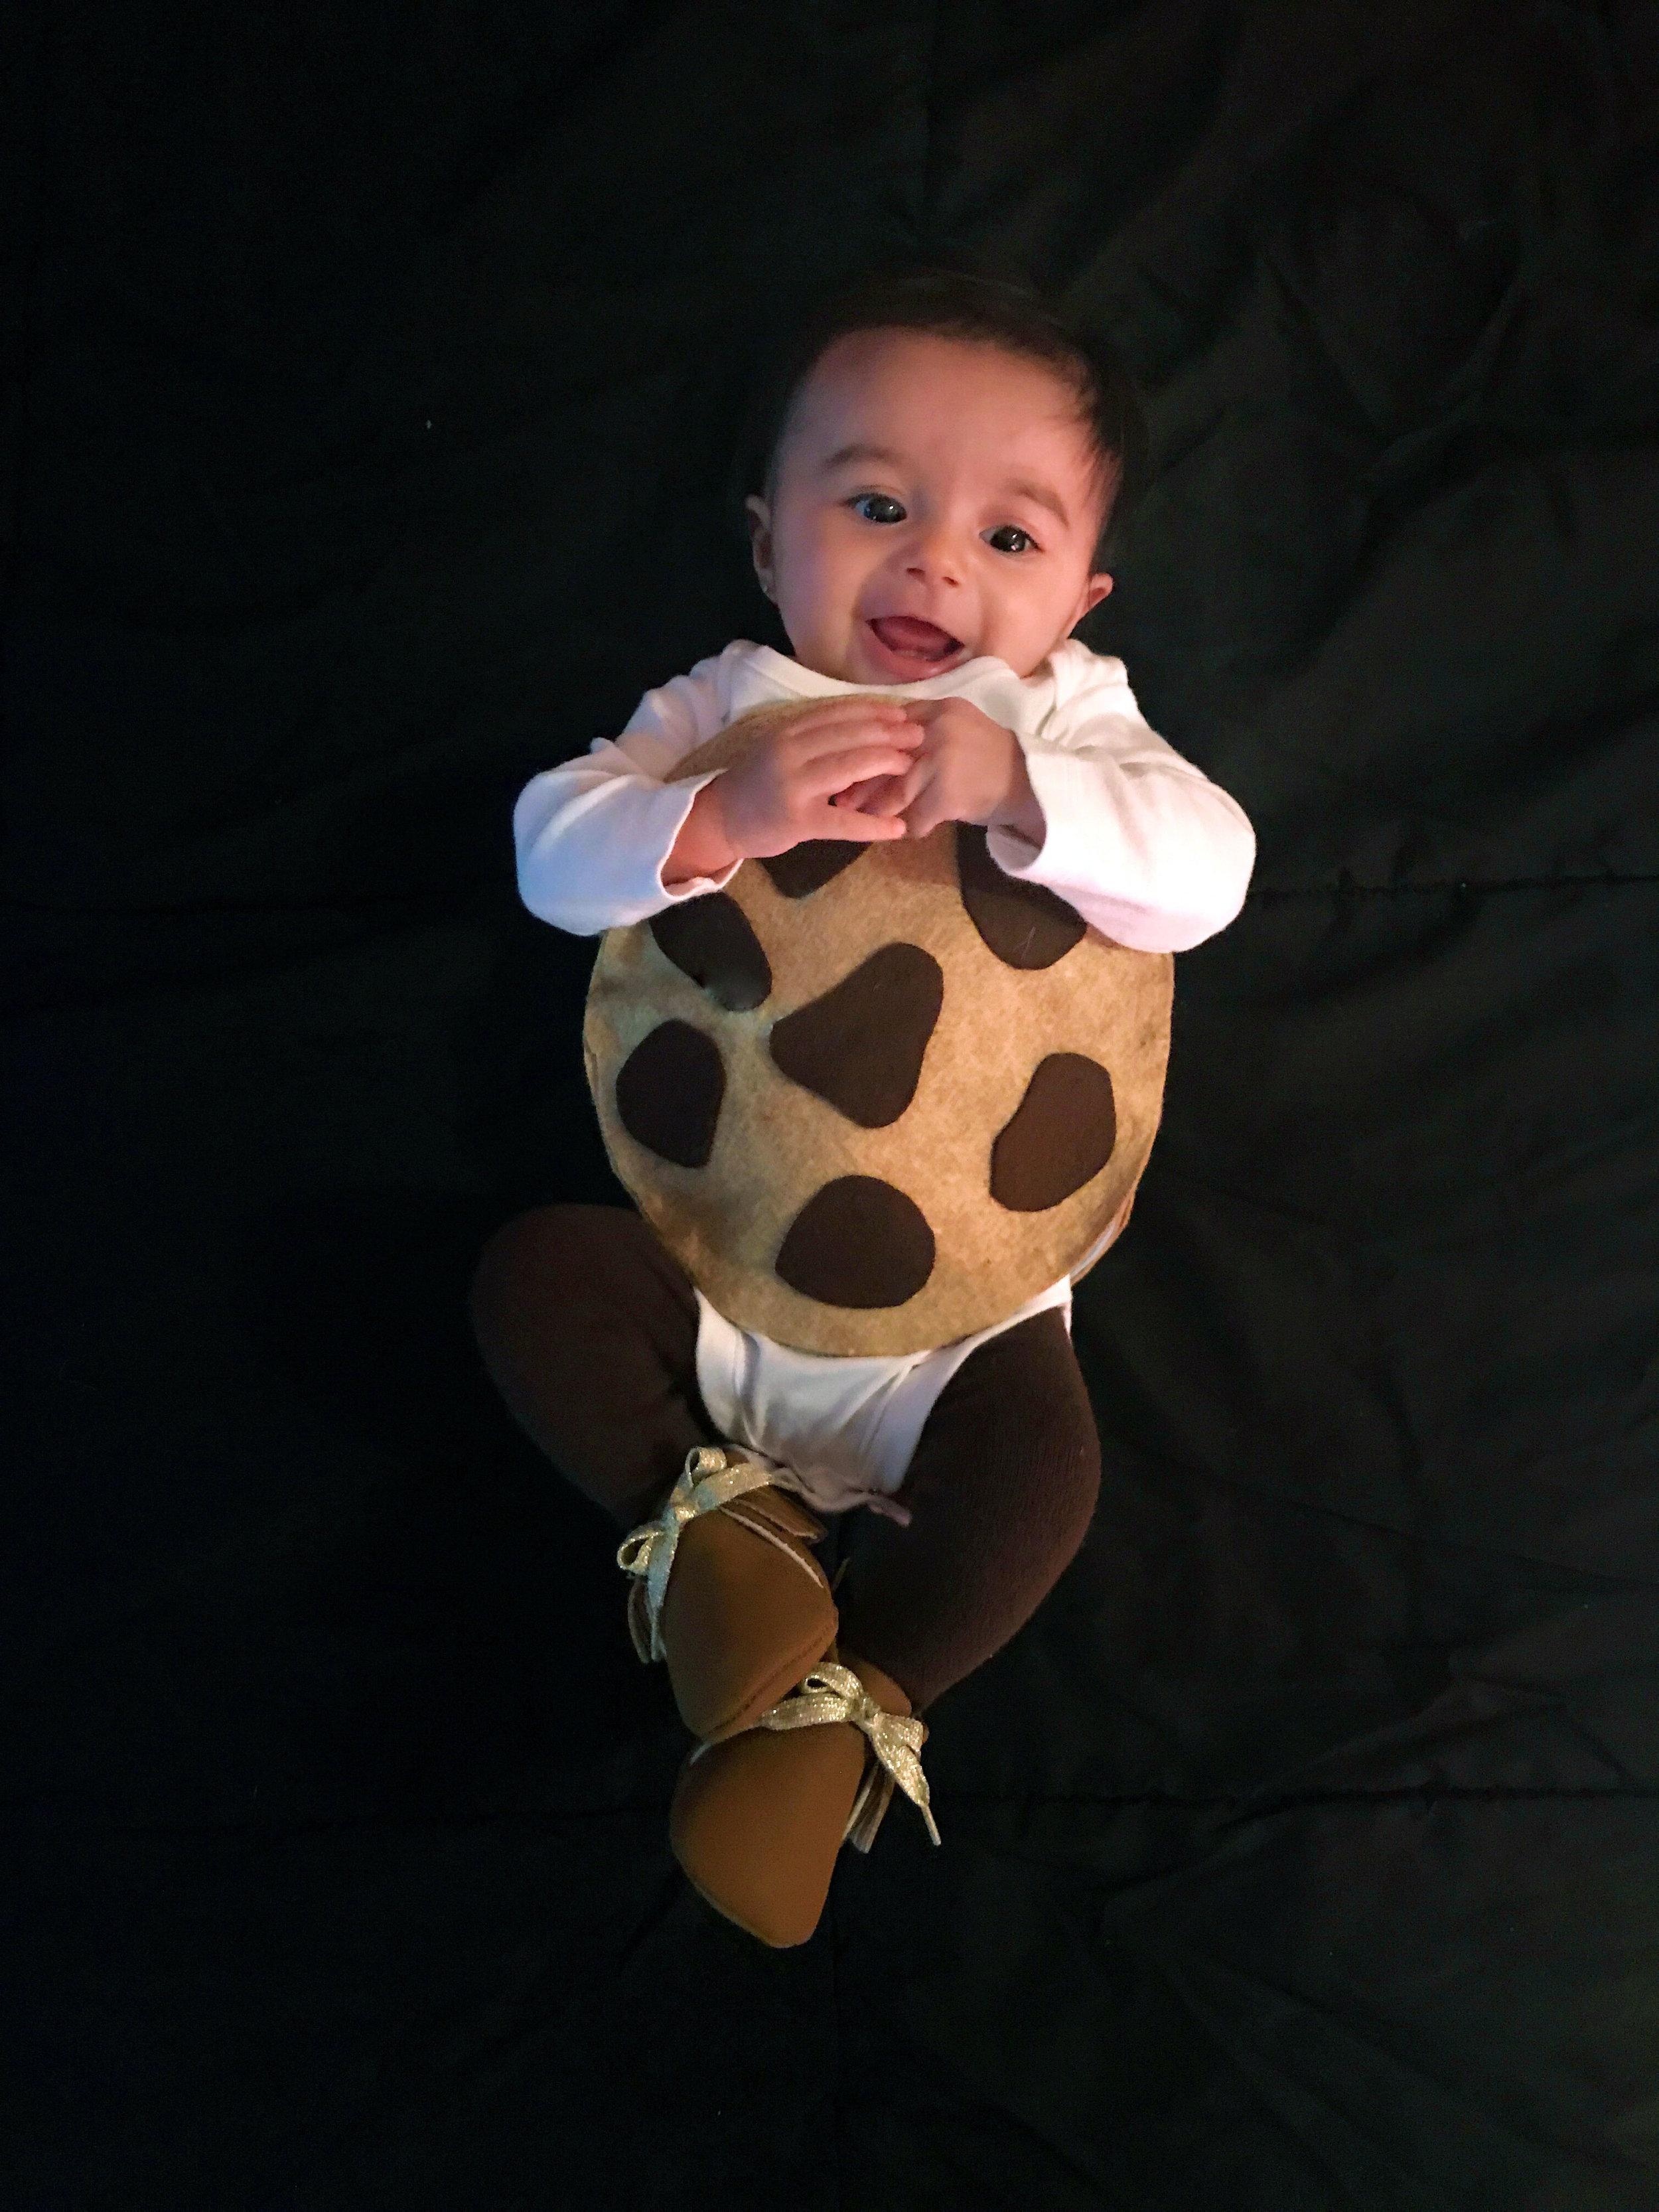 DIY cookie costume baby